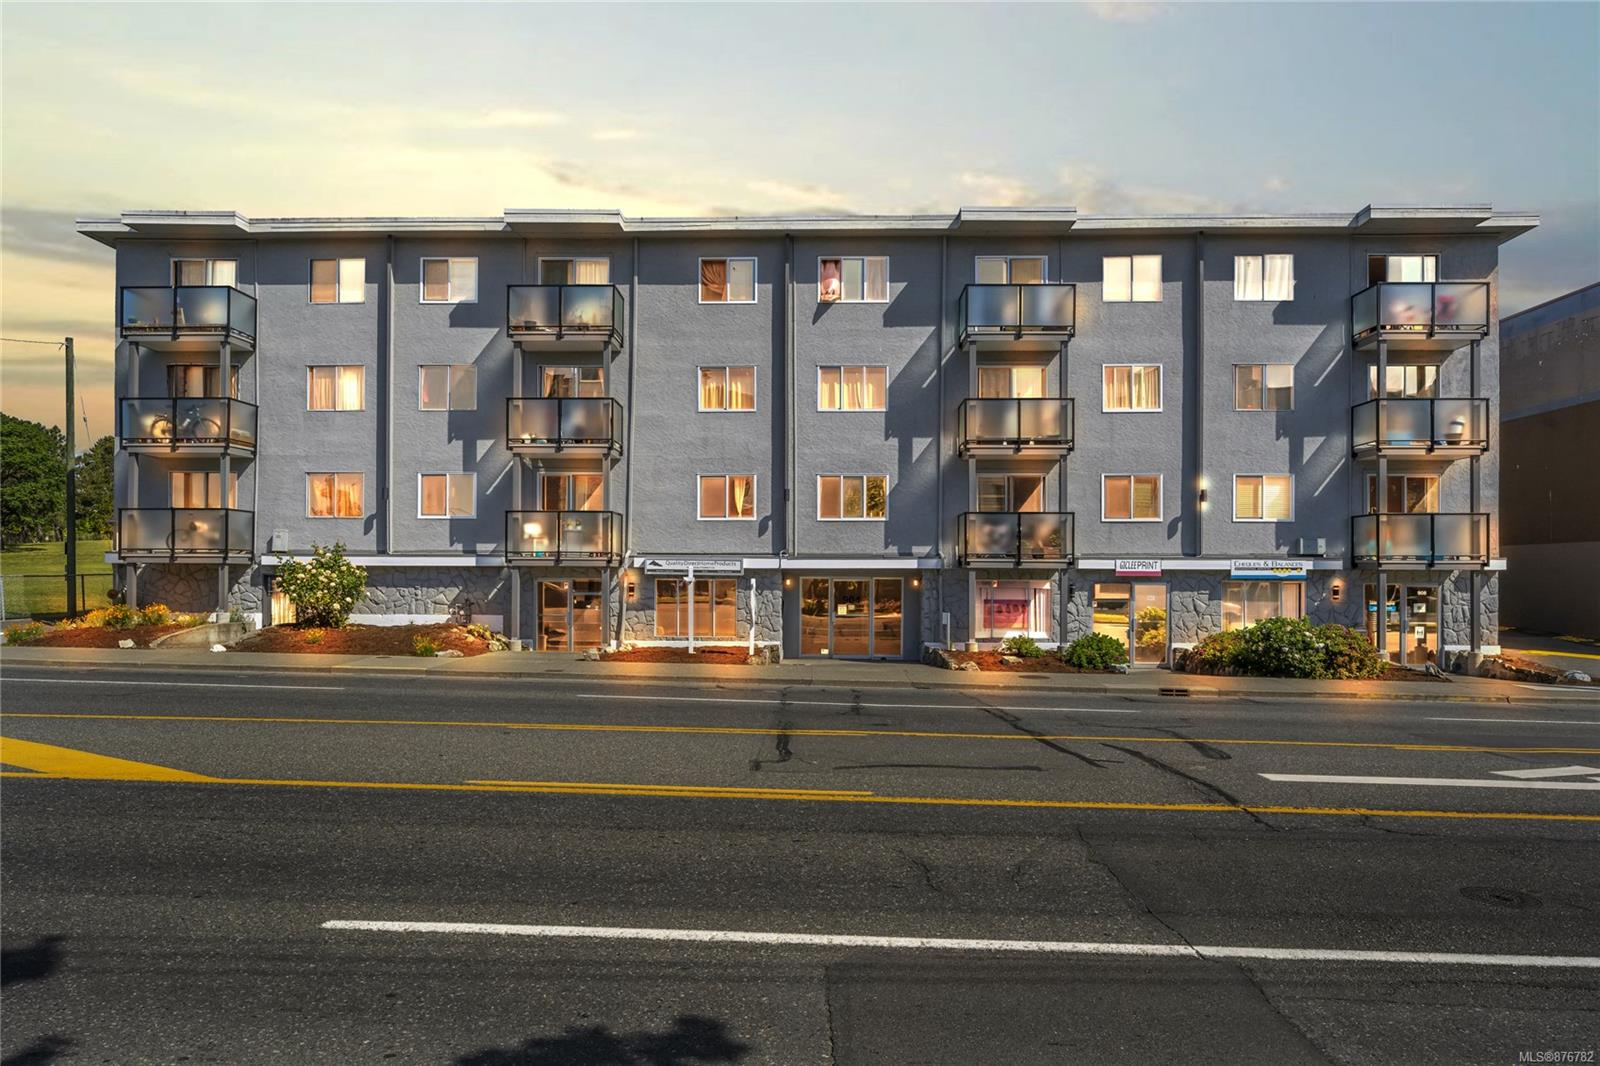 302 - 904 Hillside Avenue, Hillside, Victoria